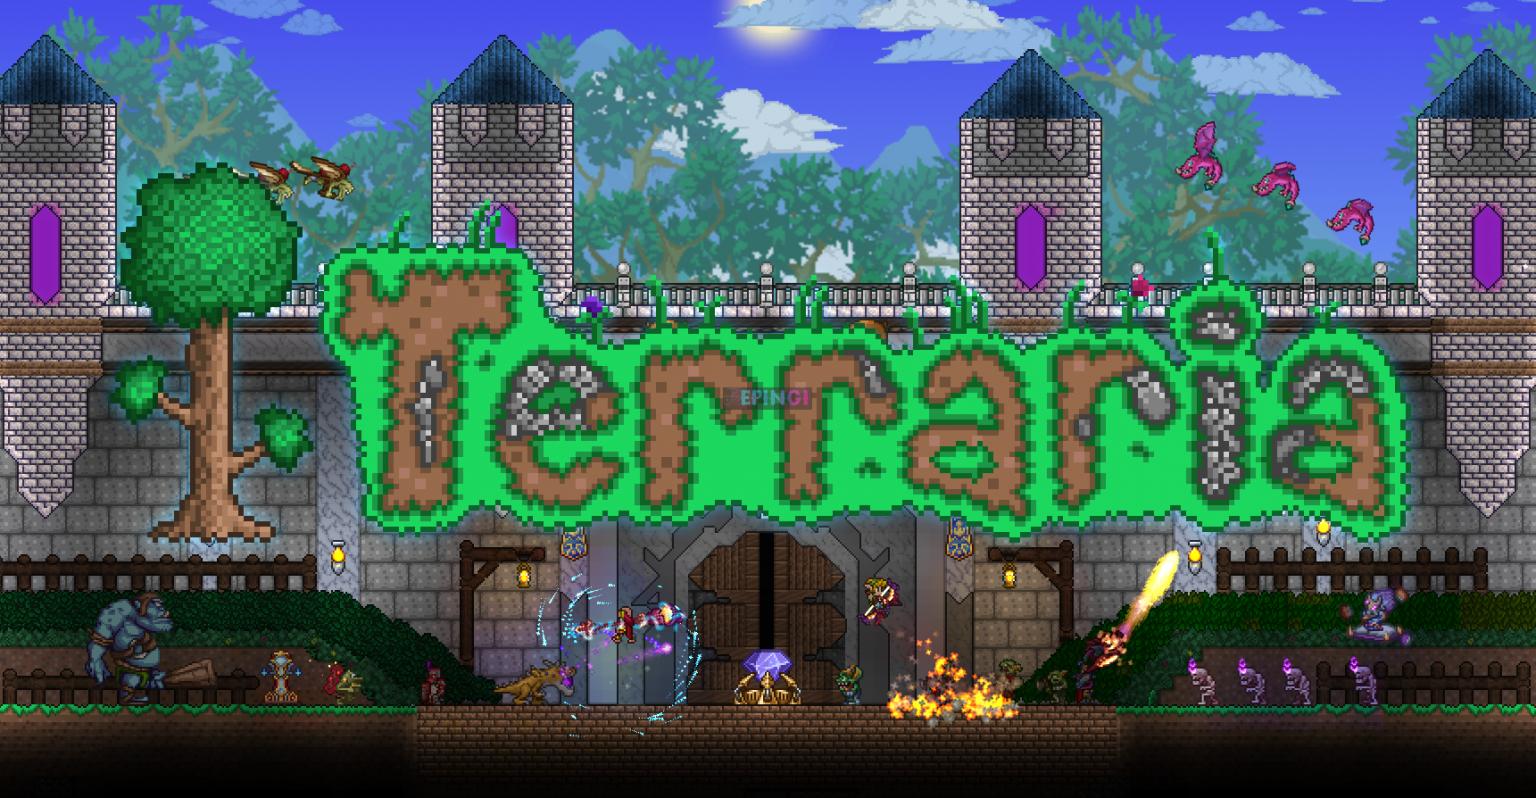 Terraria Version Full Mobile Game Free Download